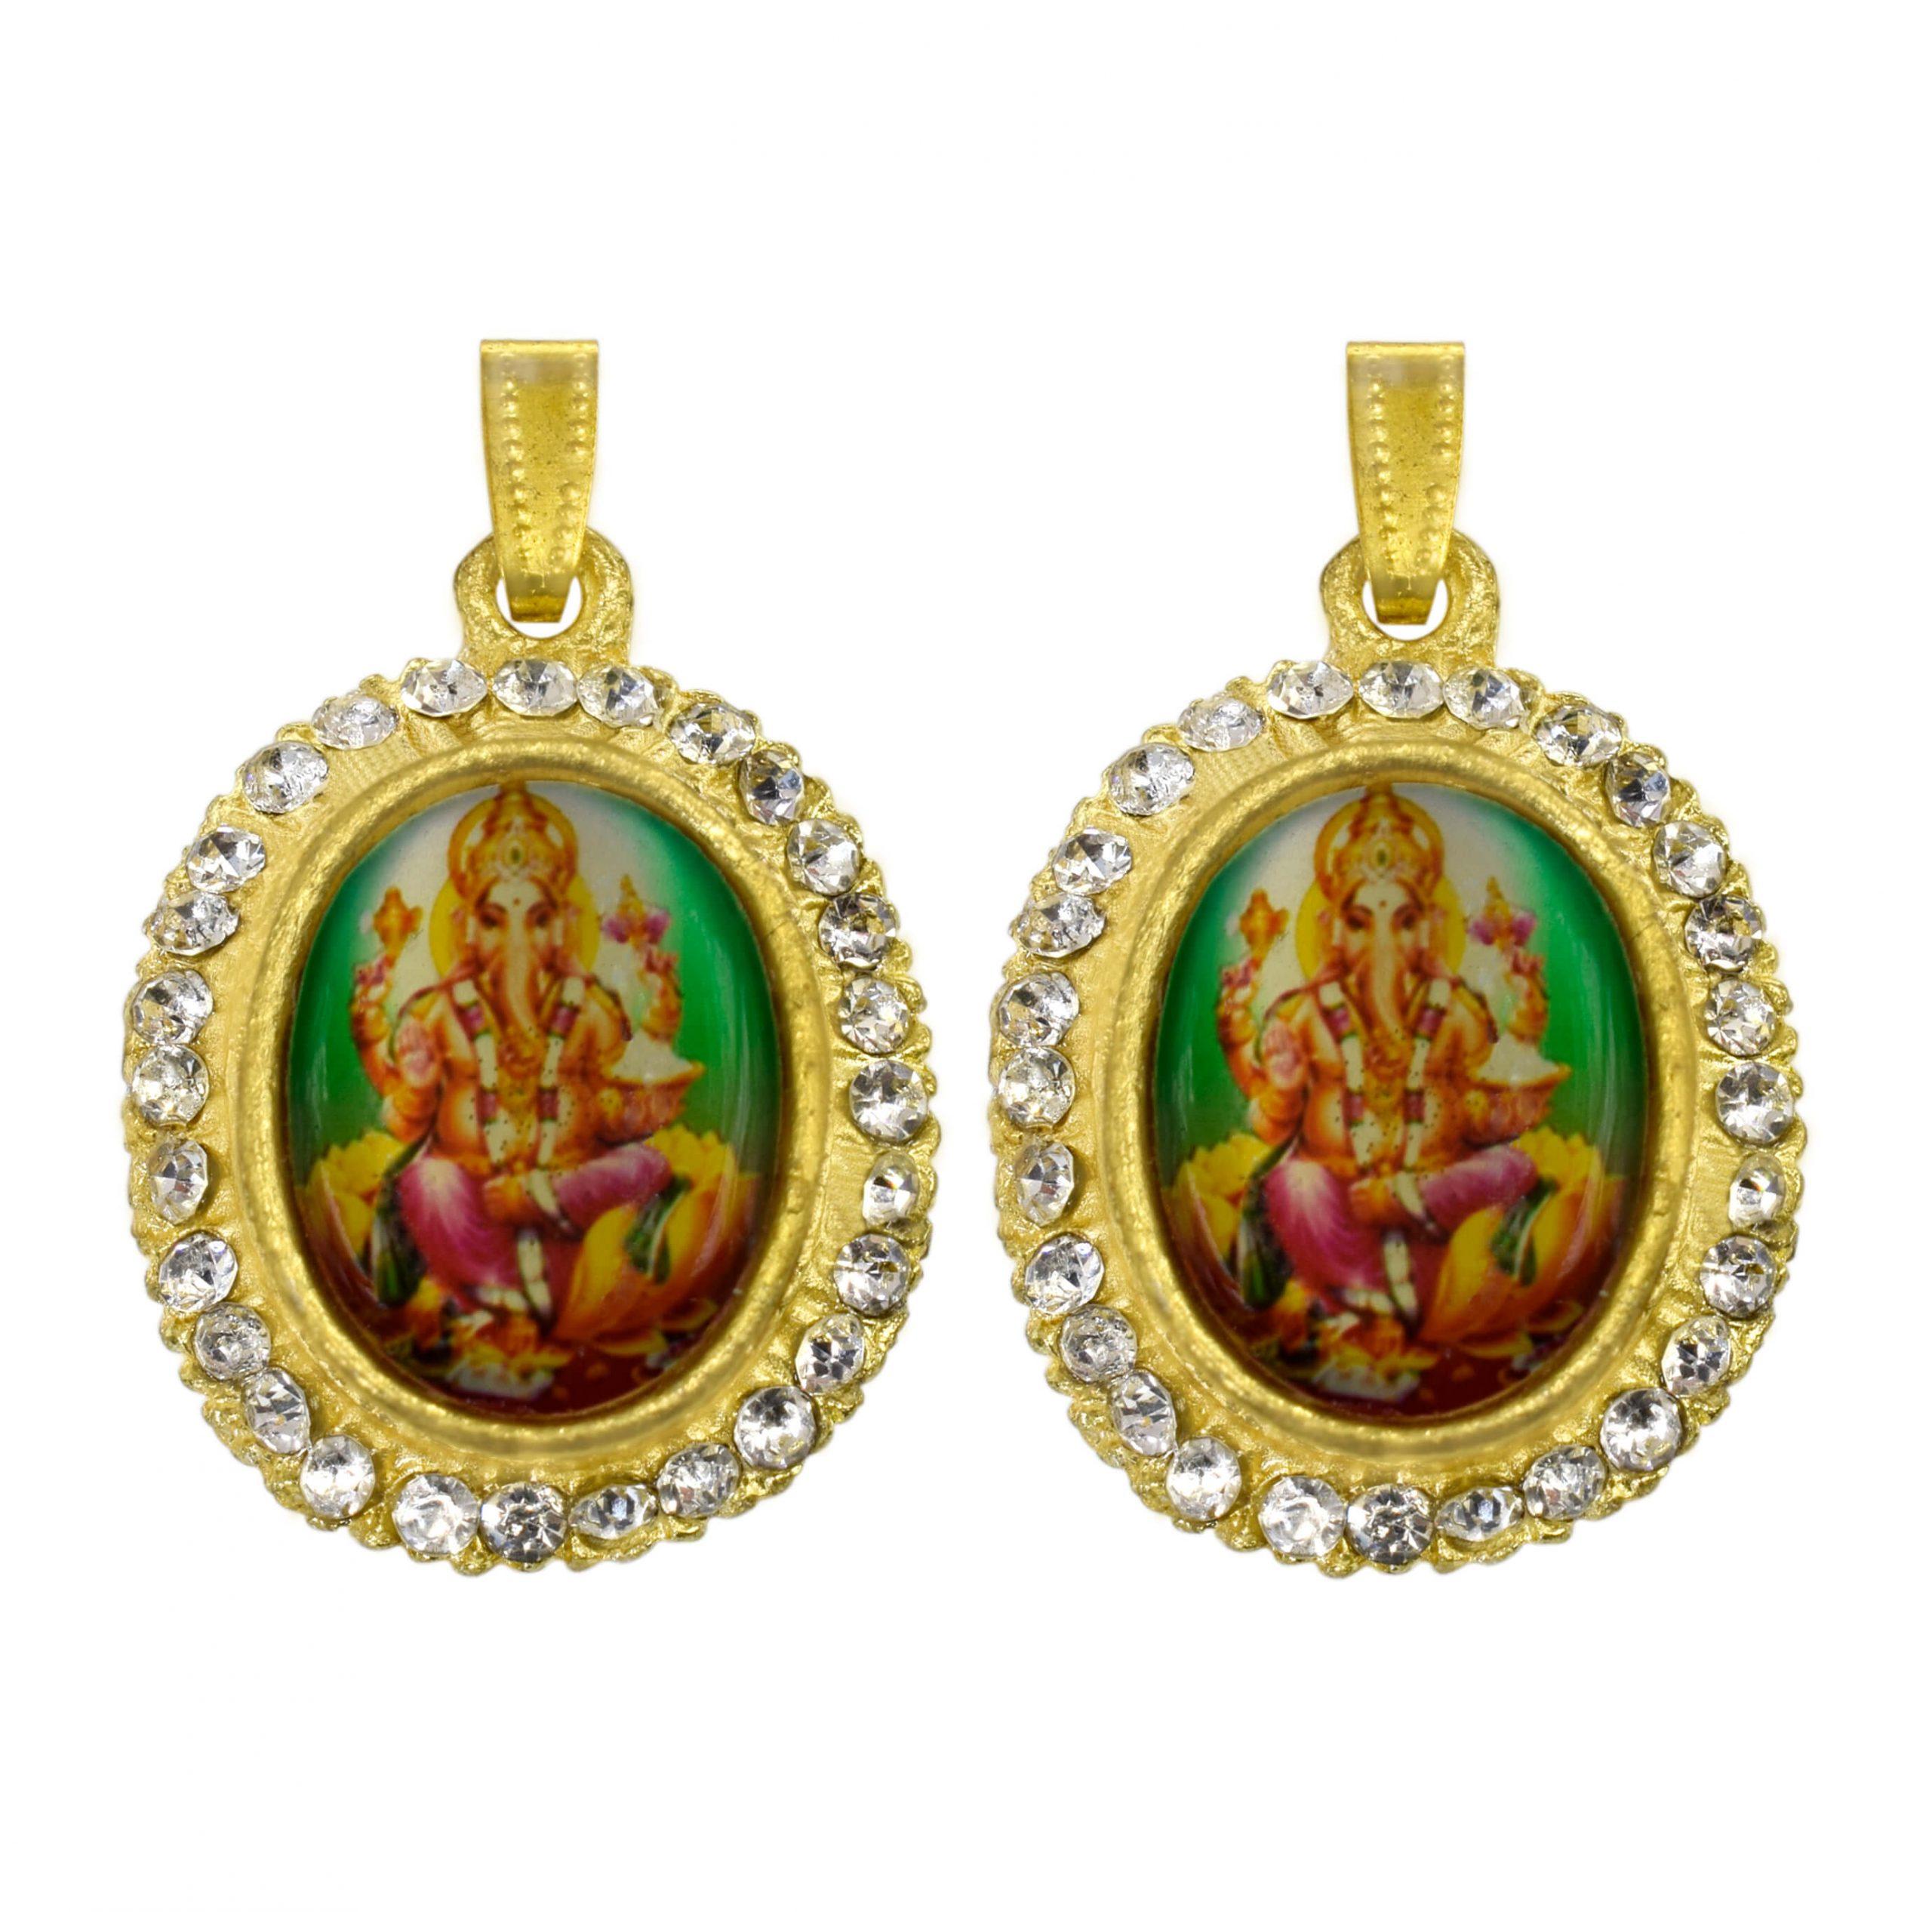 Online Buy Combo of Ganesh Pendant